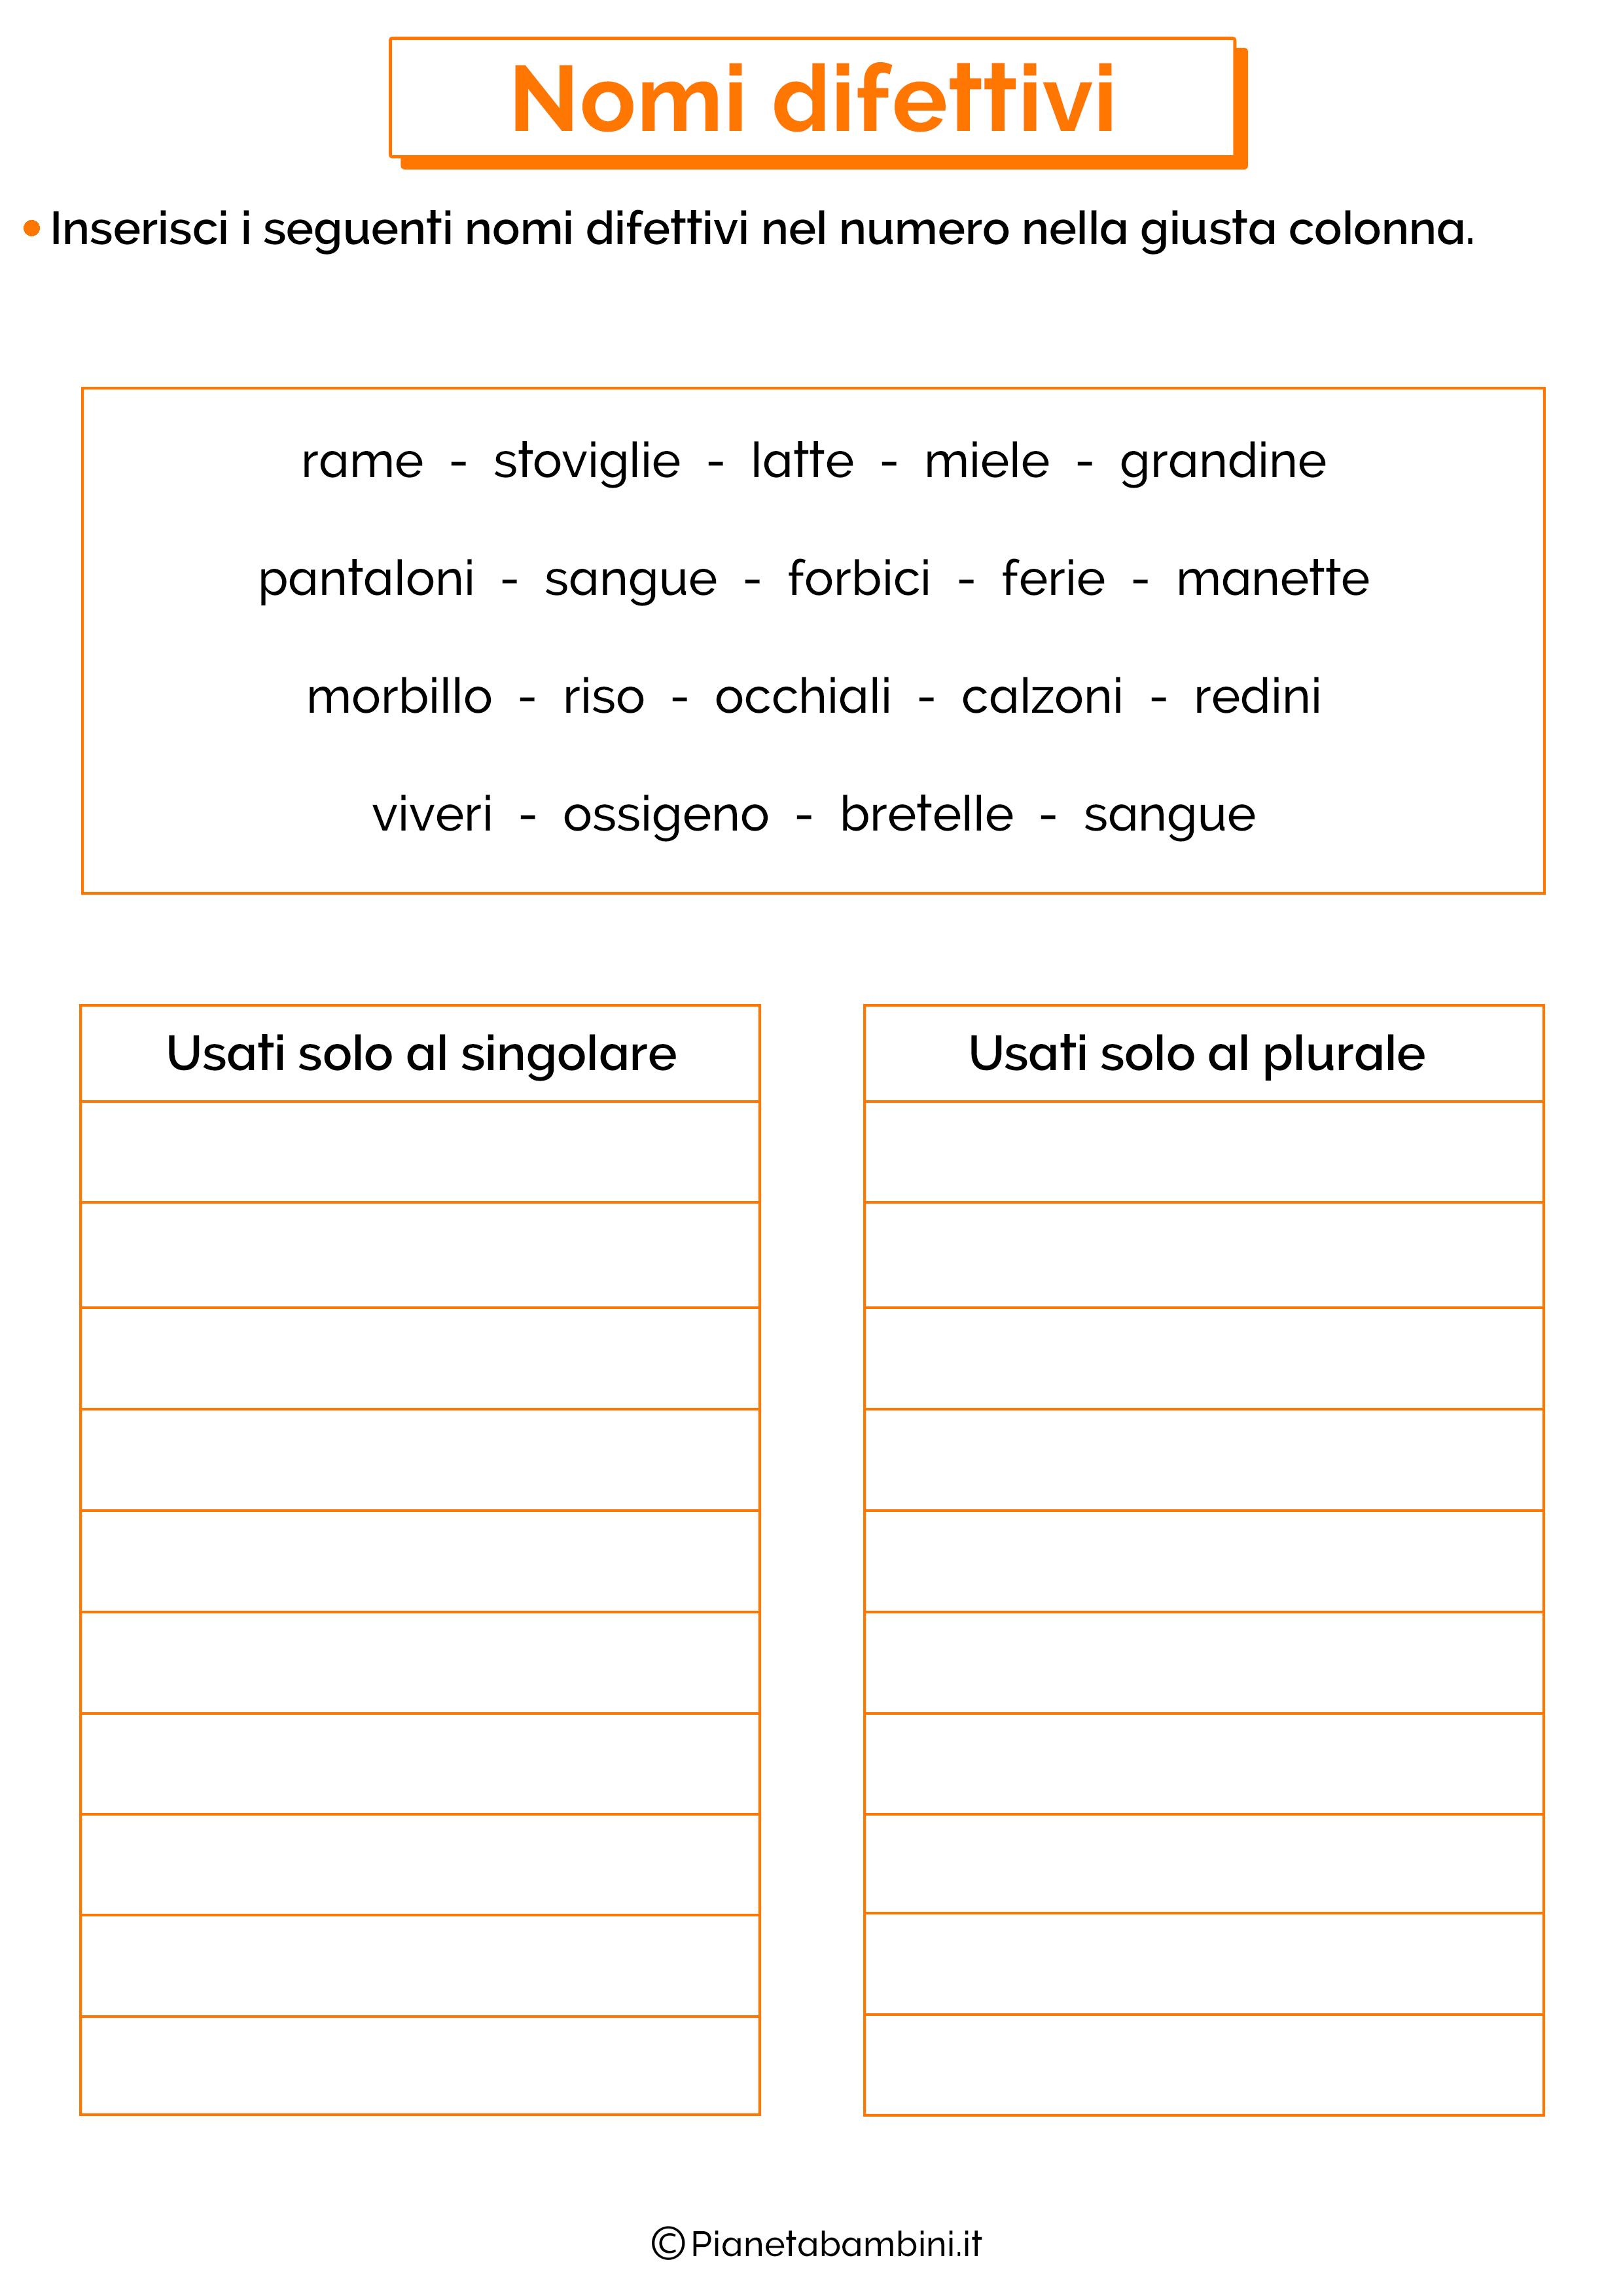 Scheda didattica sui nomi difettivi